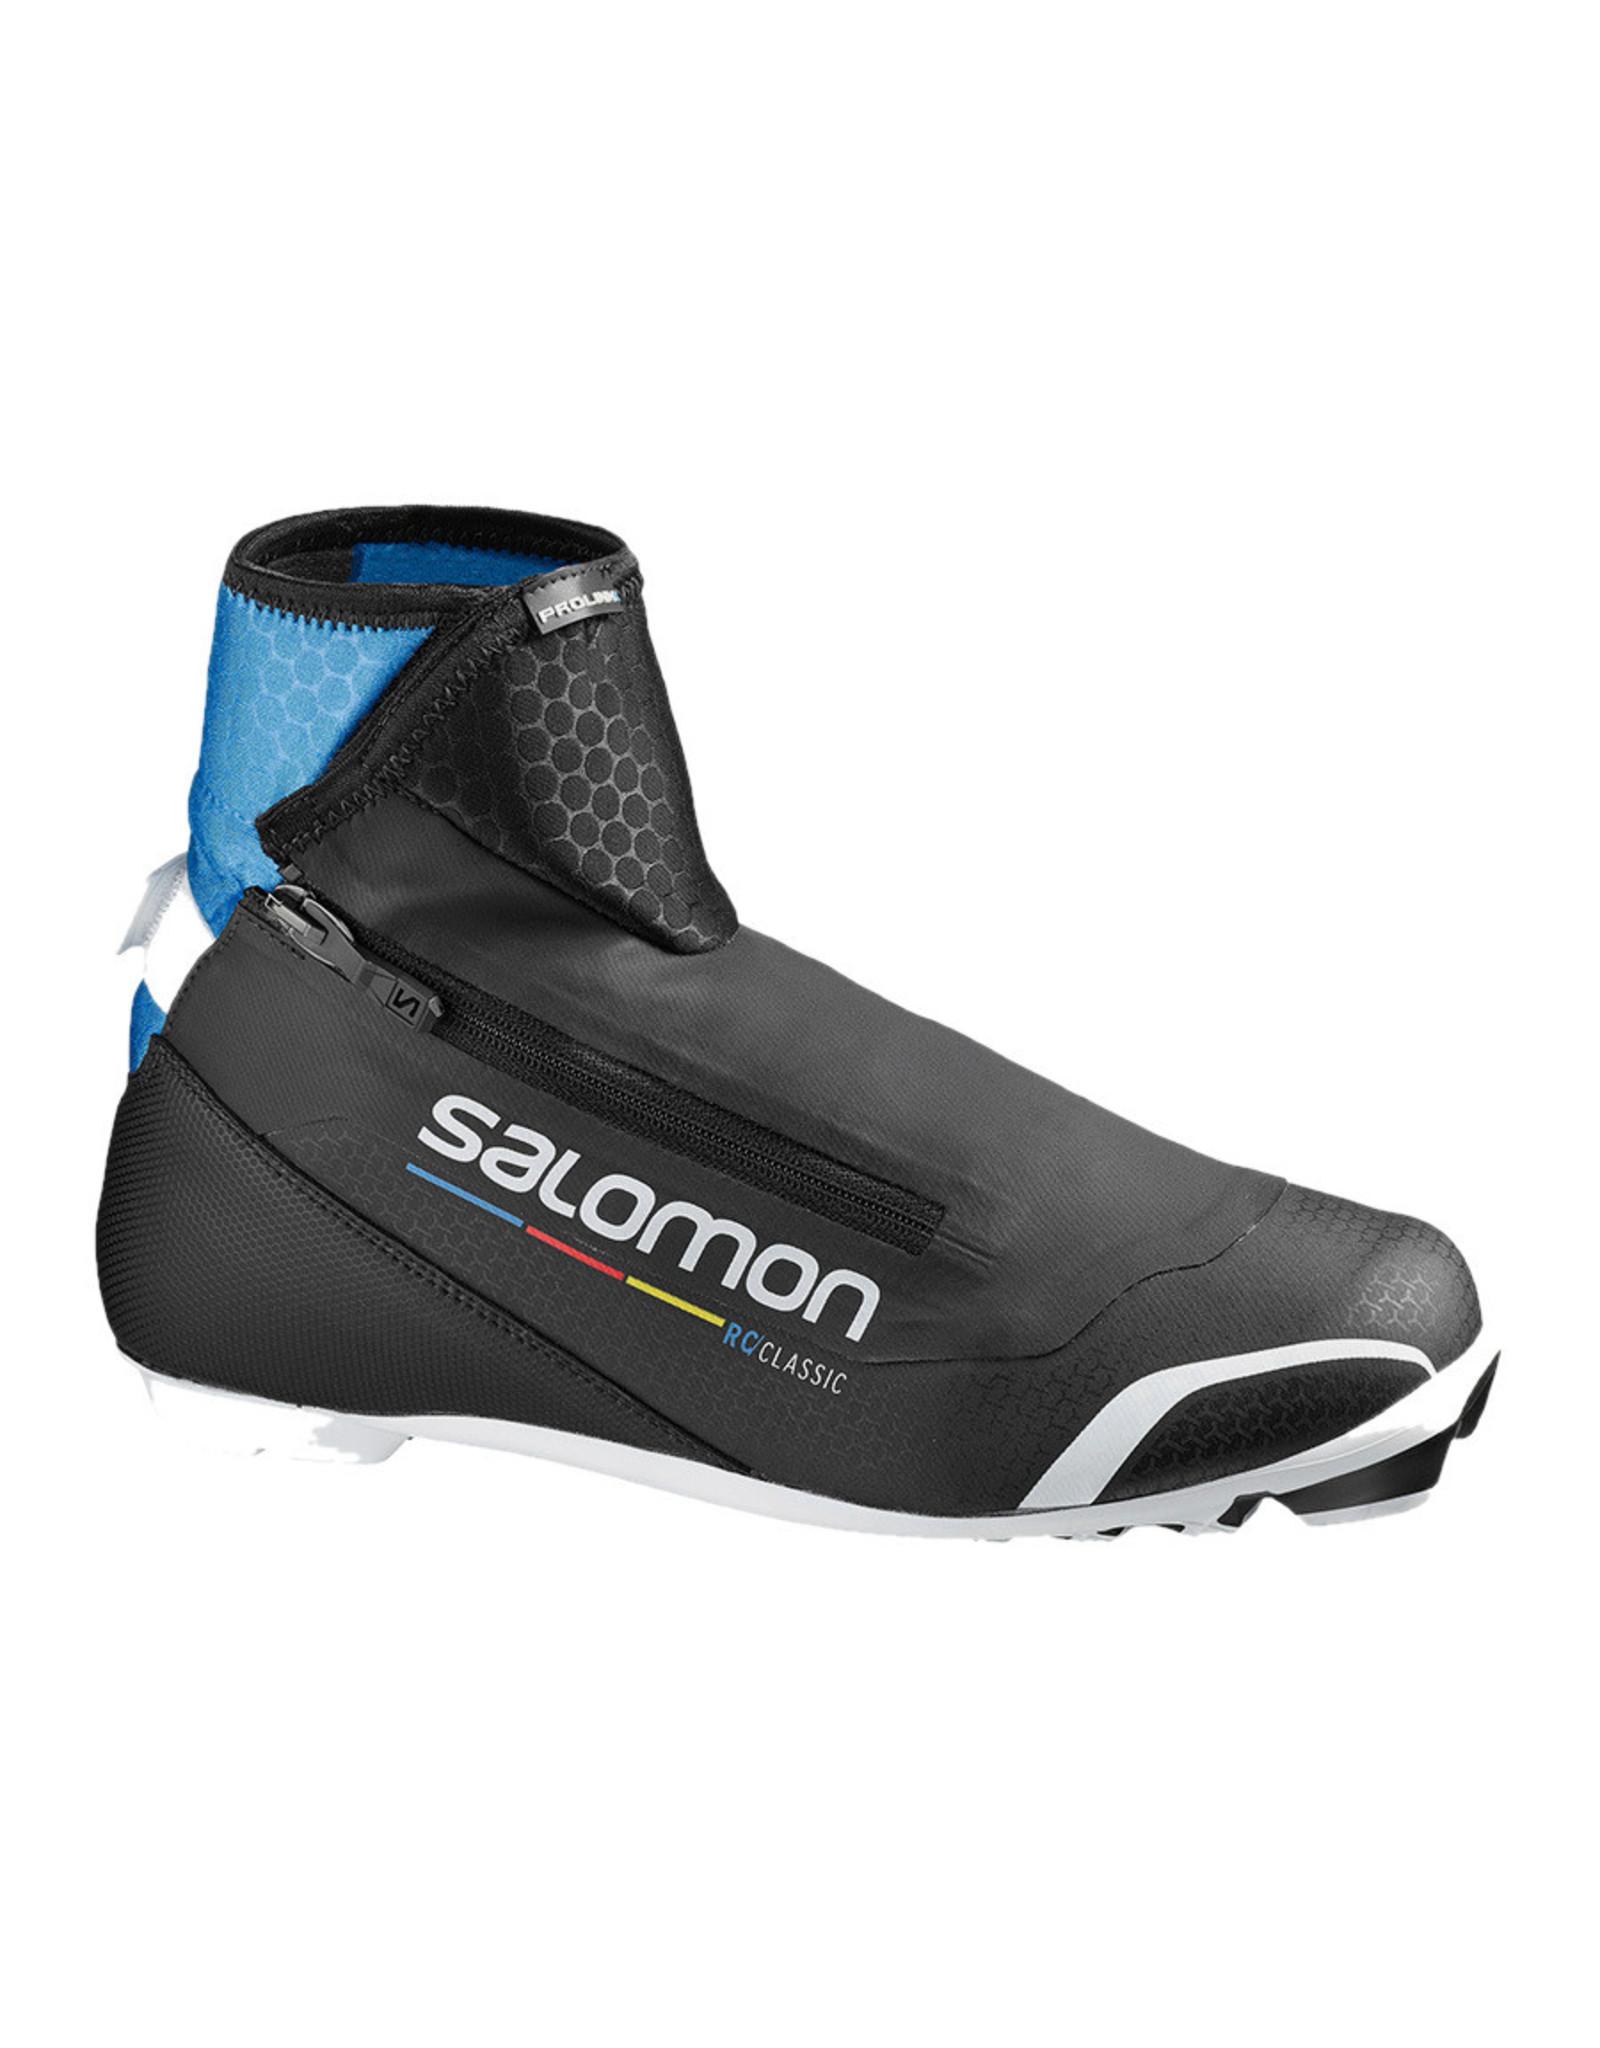 Salomon Salomon RC Prolink Boot